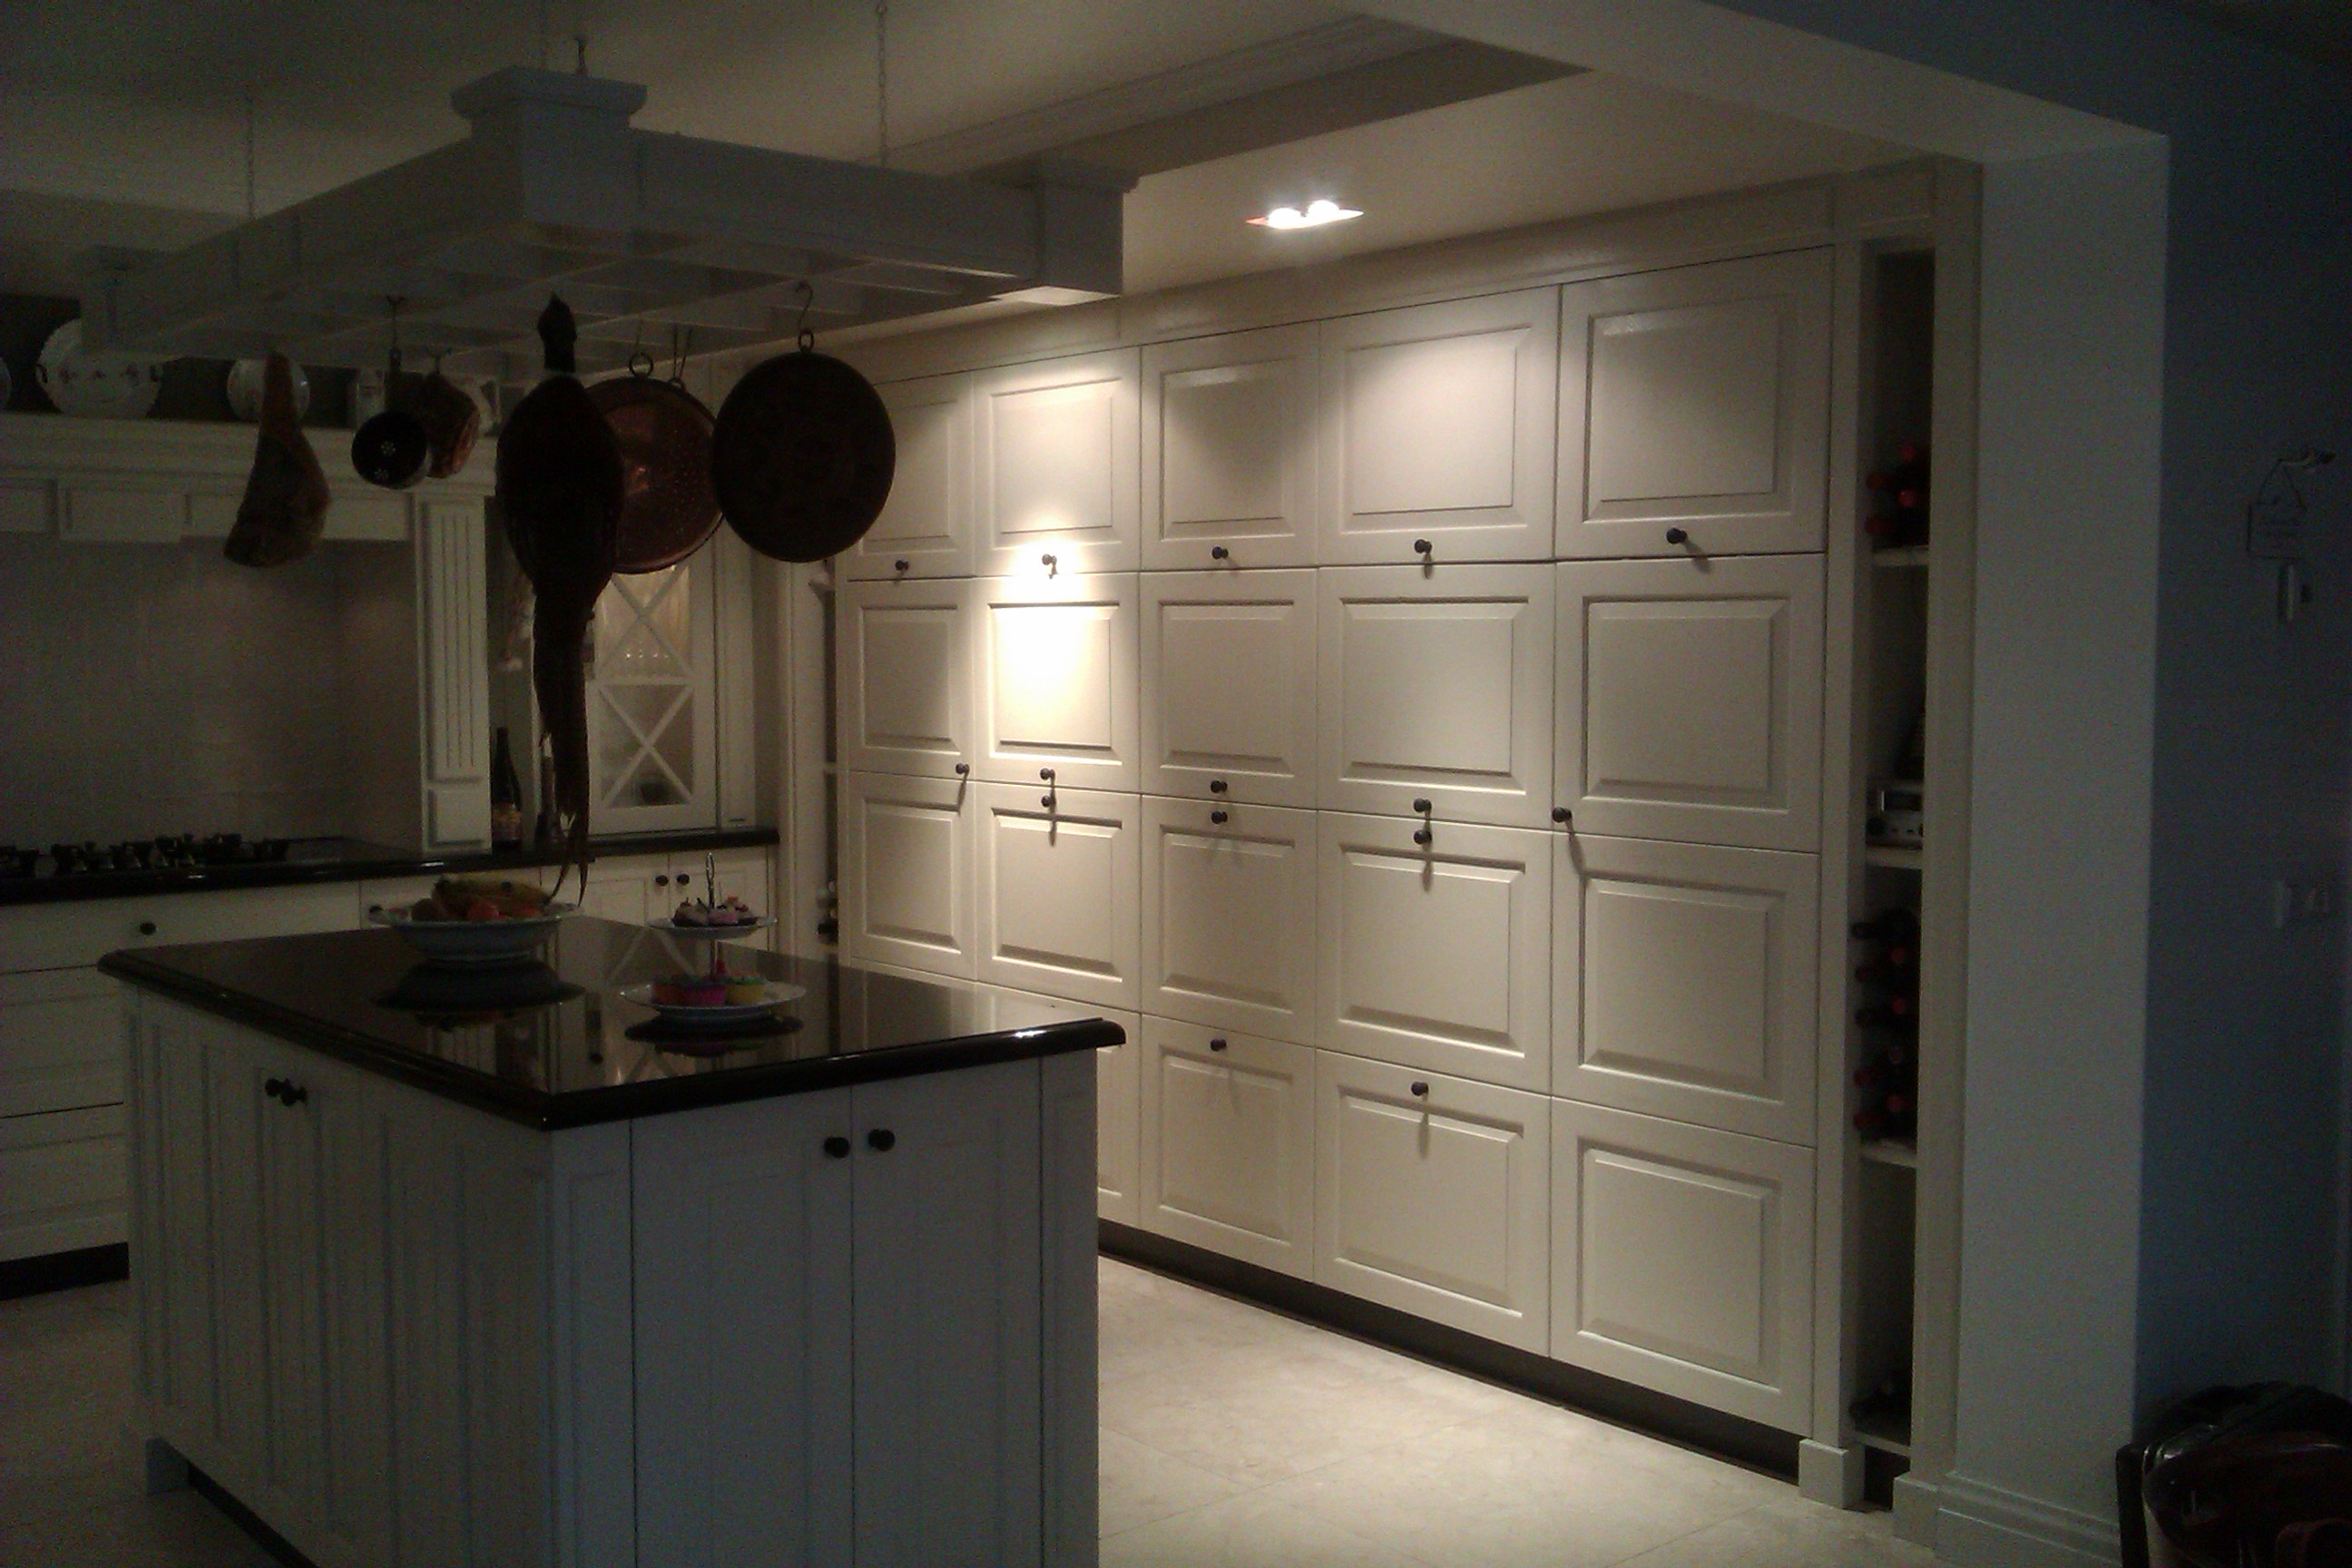 keuken002